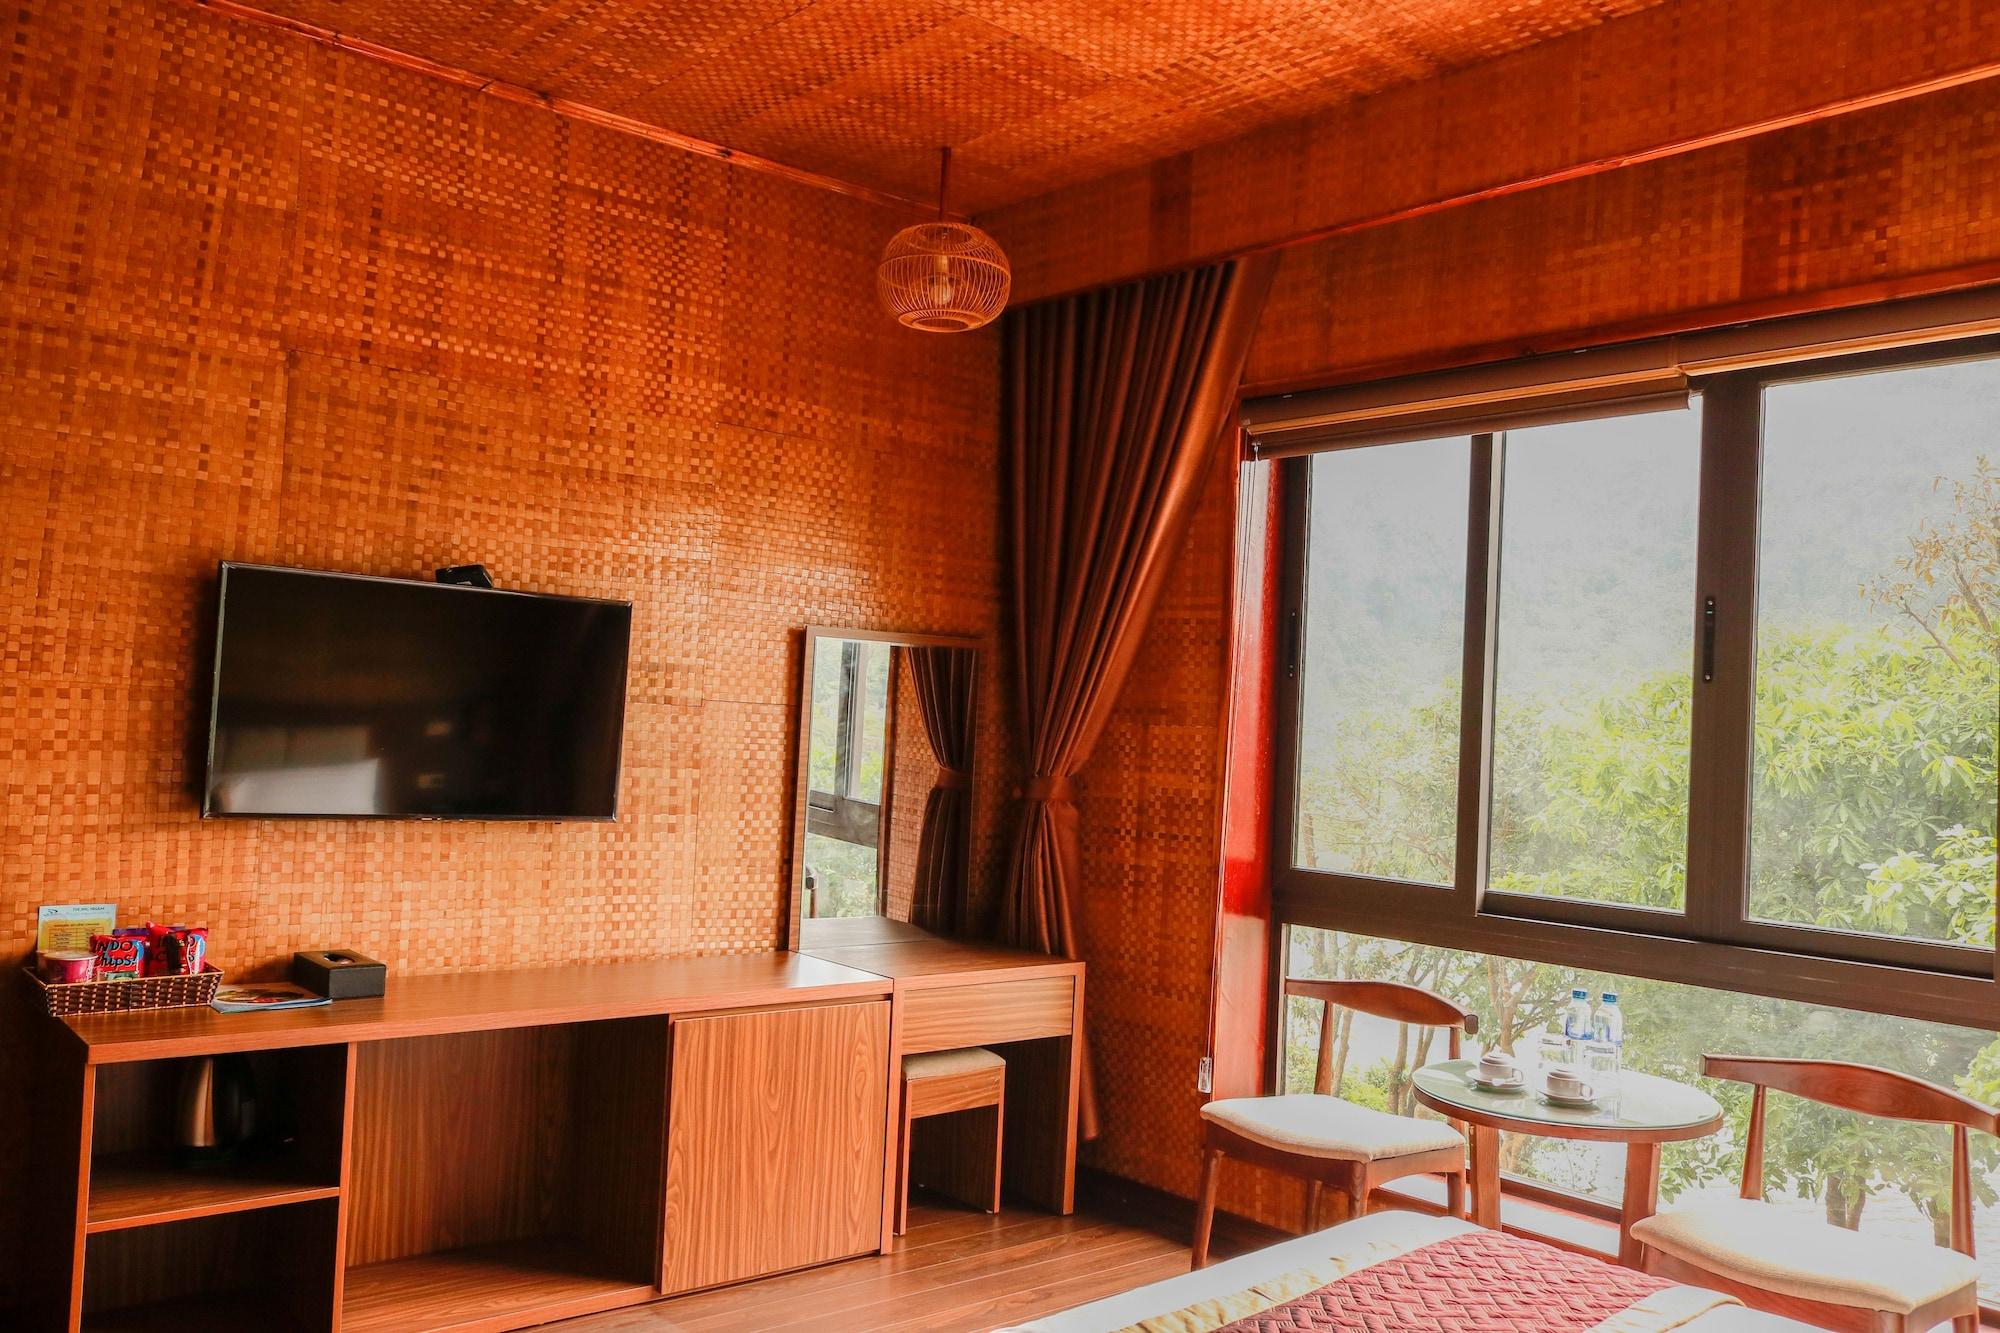 Thung Nham Hotel & Resort, Hoa Lư